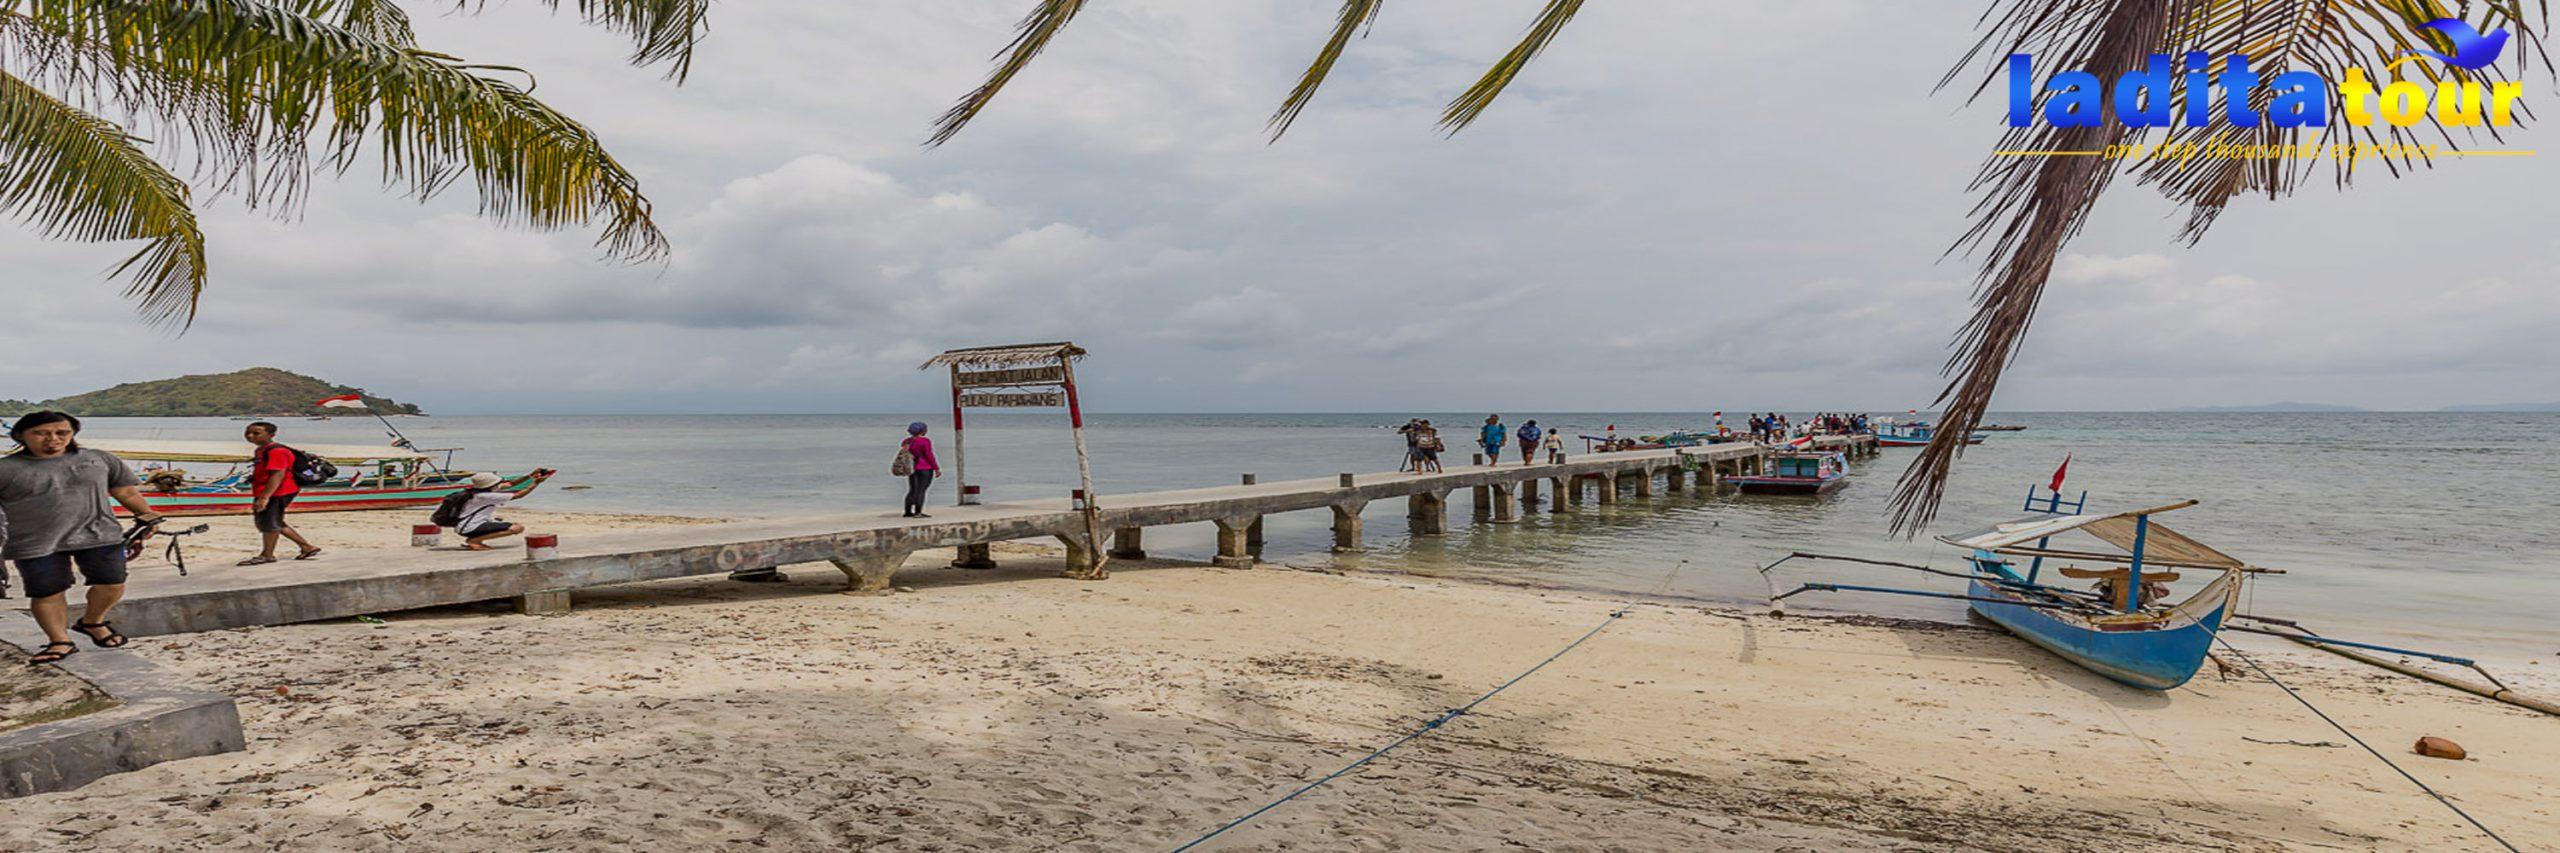 PAKET WISATA Pulau Pahawang dari Bandung